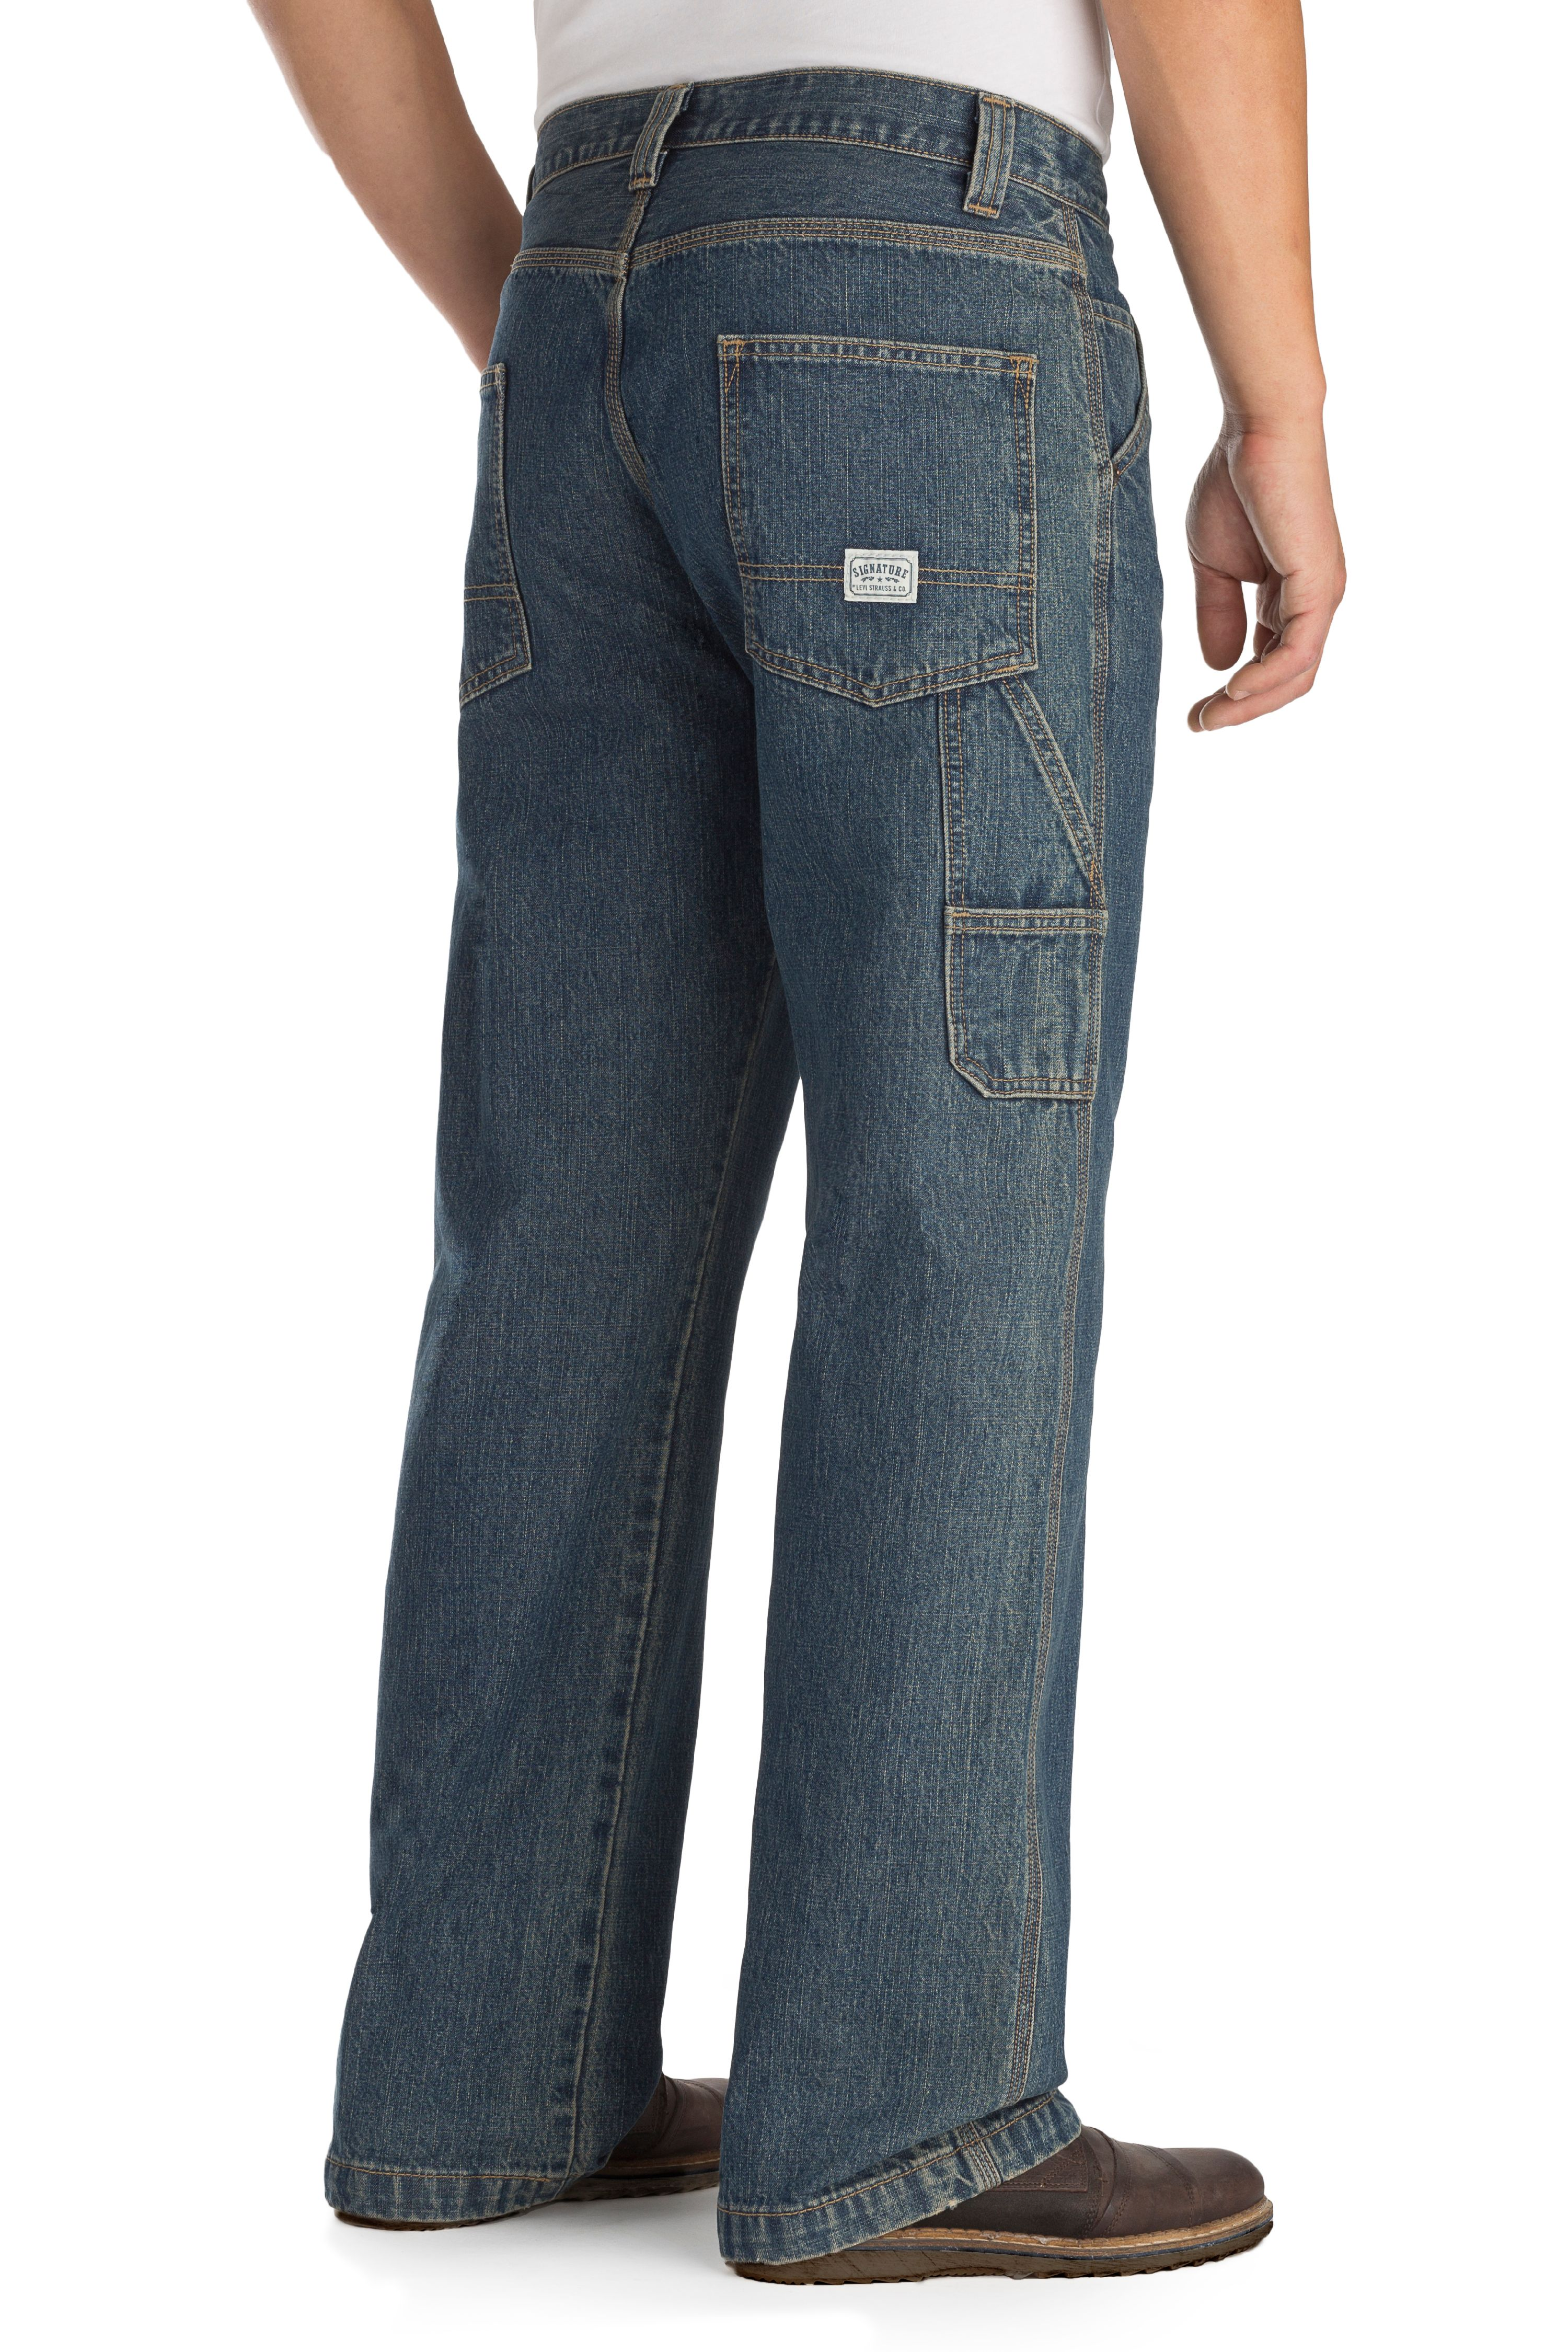 bec513f26fc Signature by Levi Strauss   Co. Men s Carpenter Jeans nbsp  - Walmart.com